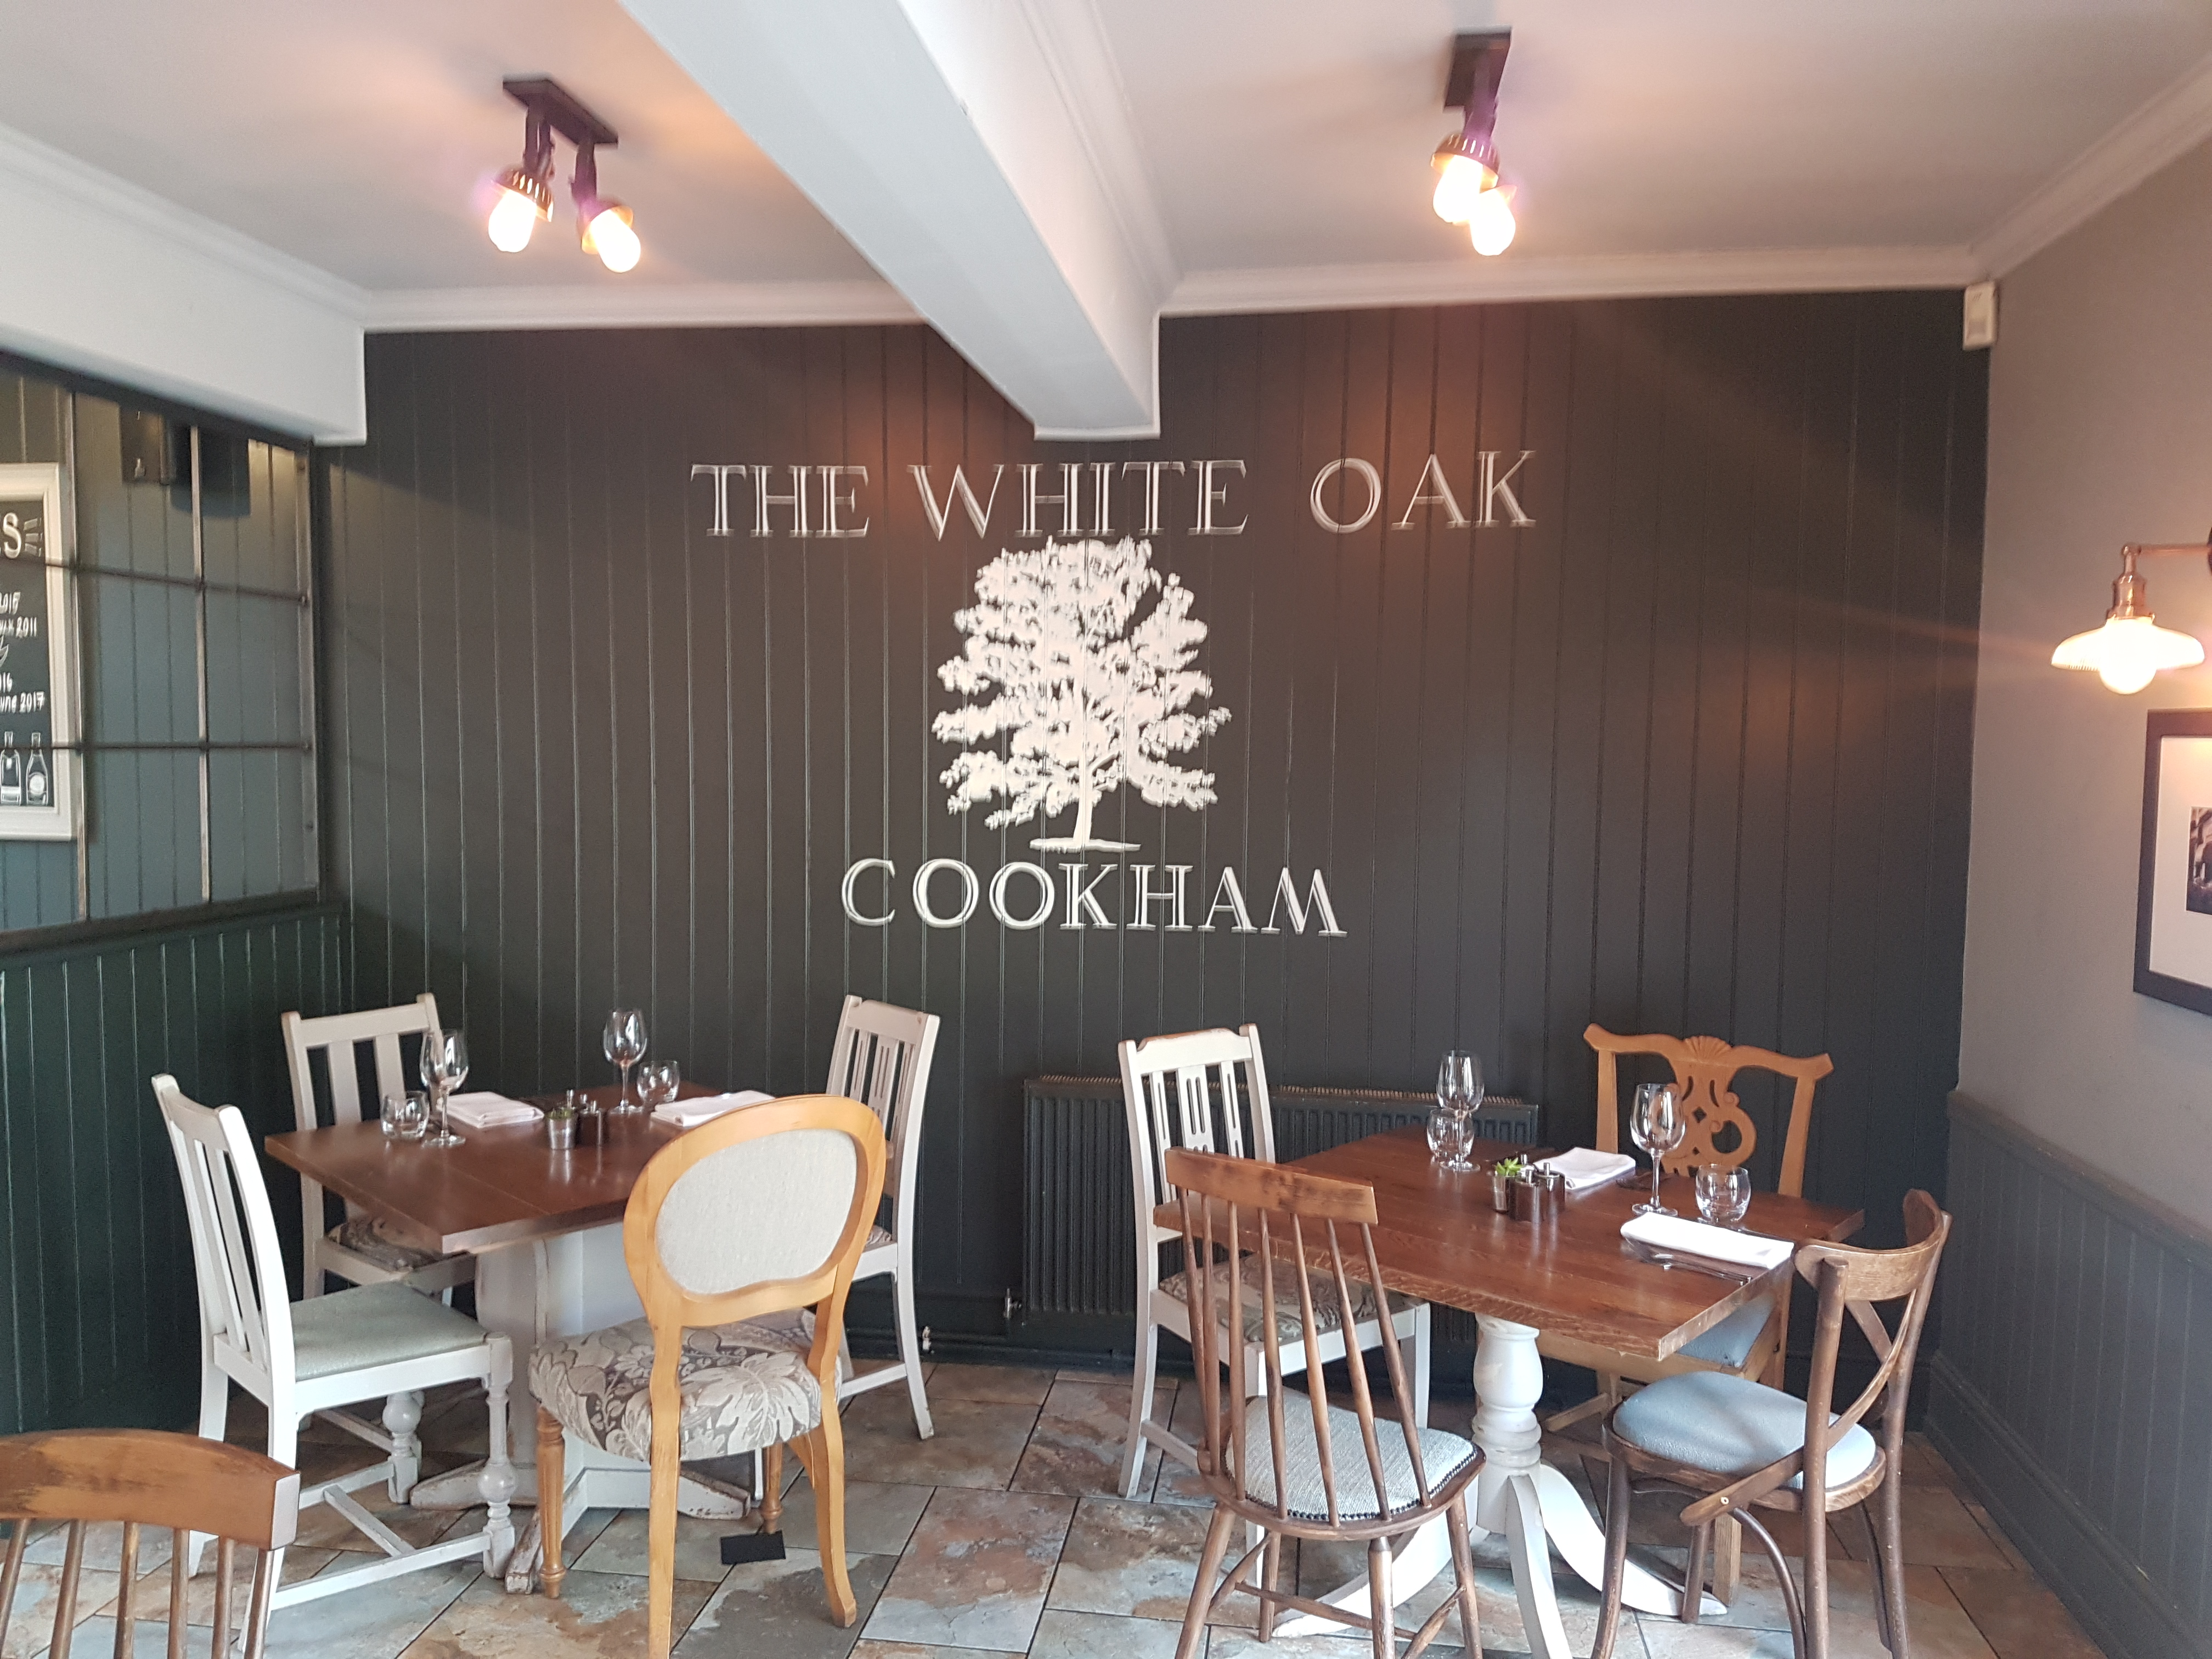 DJ for The White Oak, Cookham